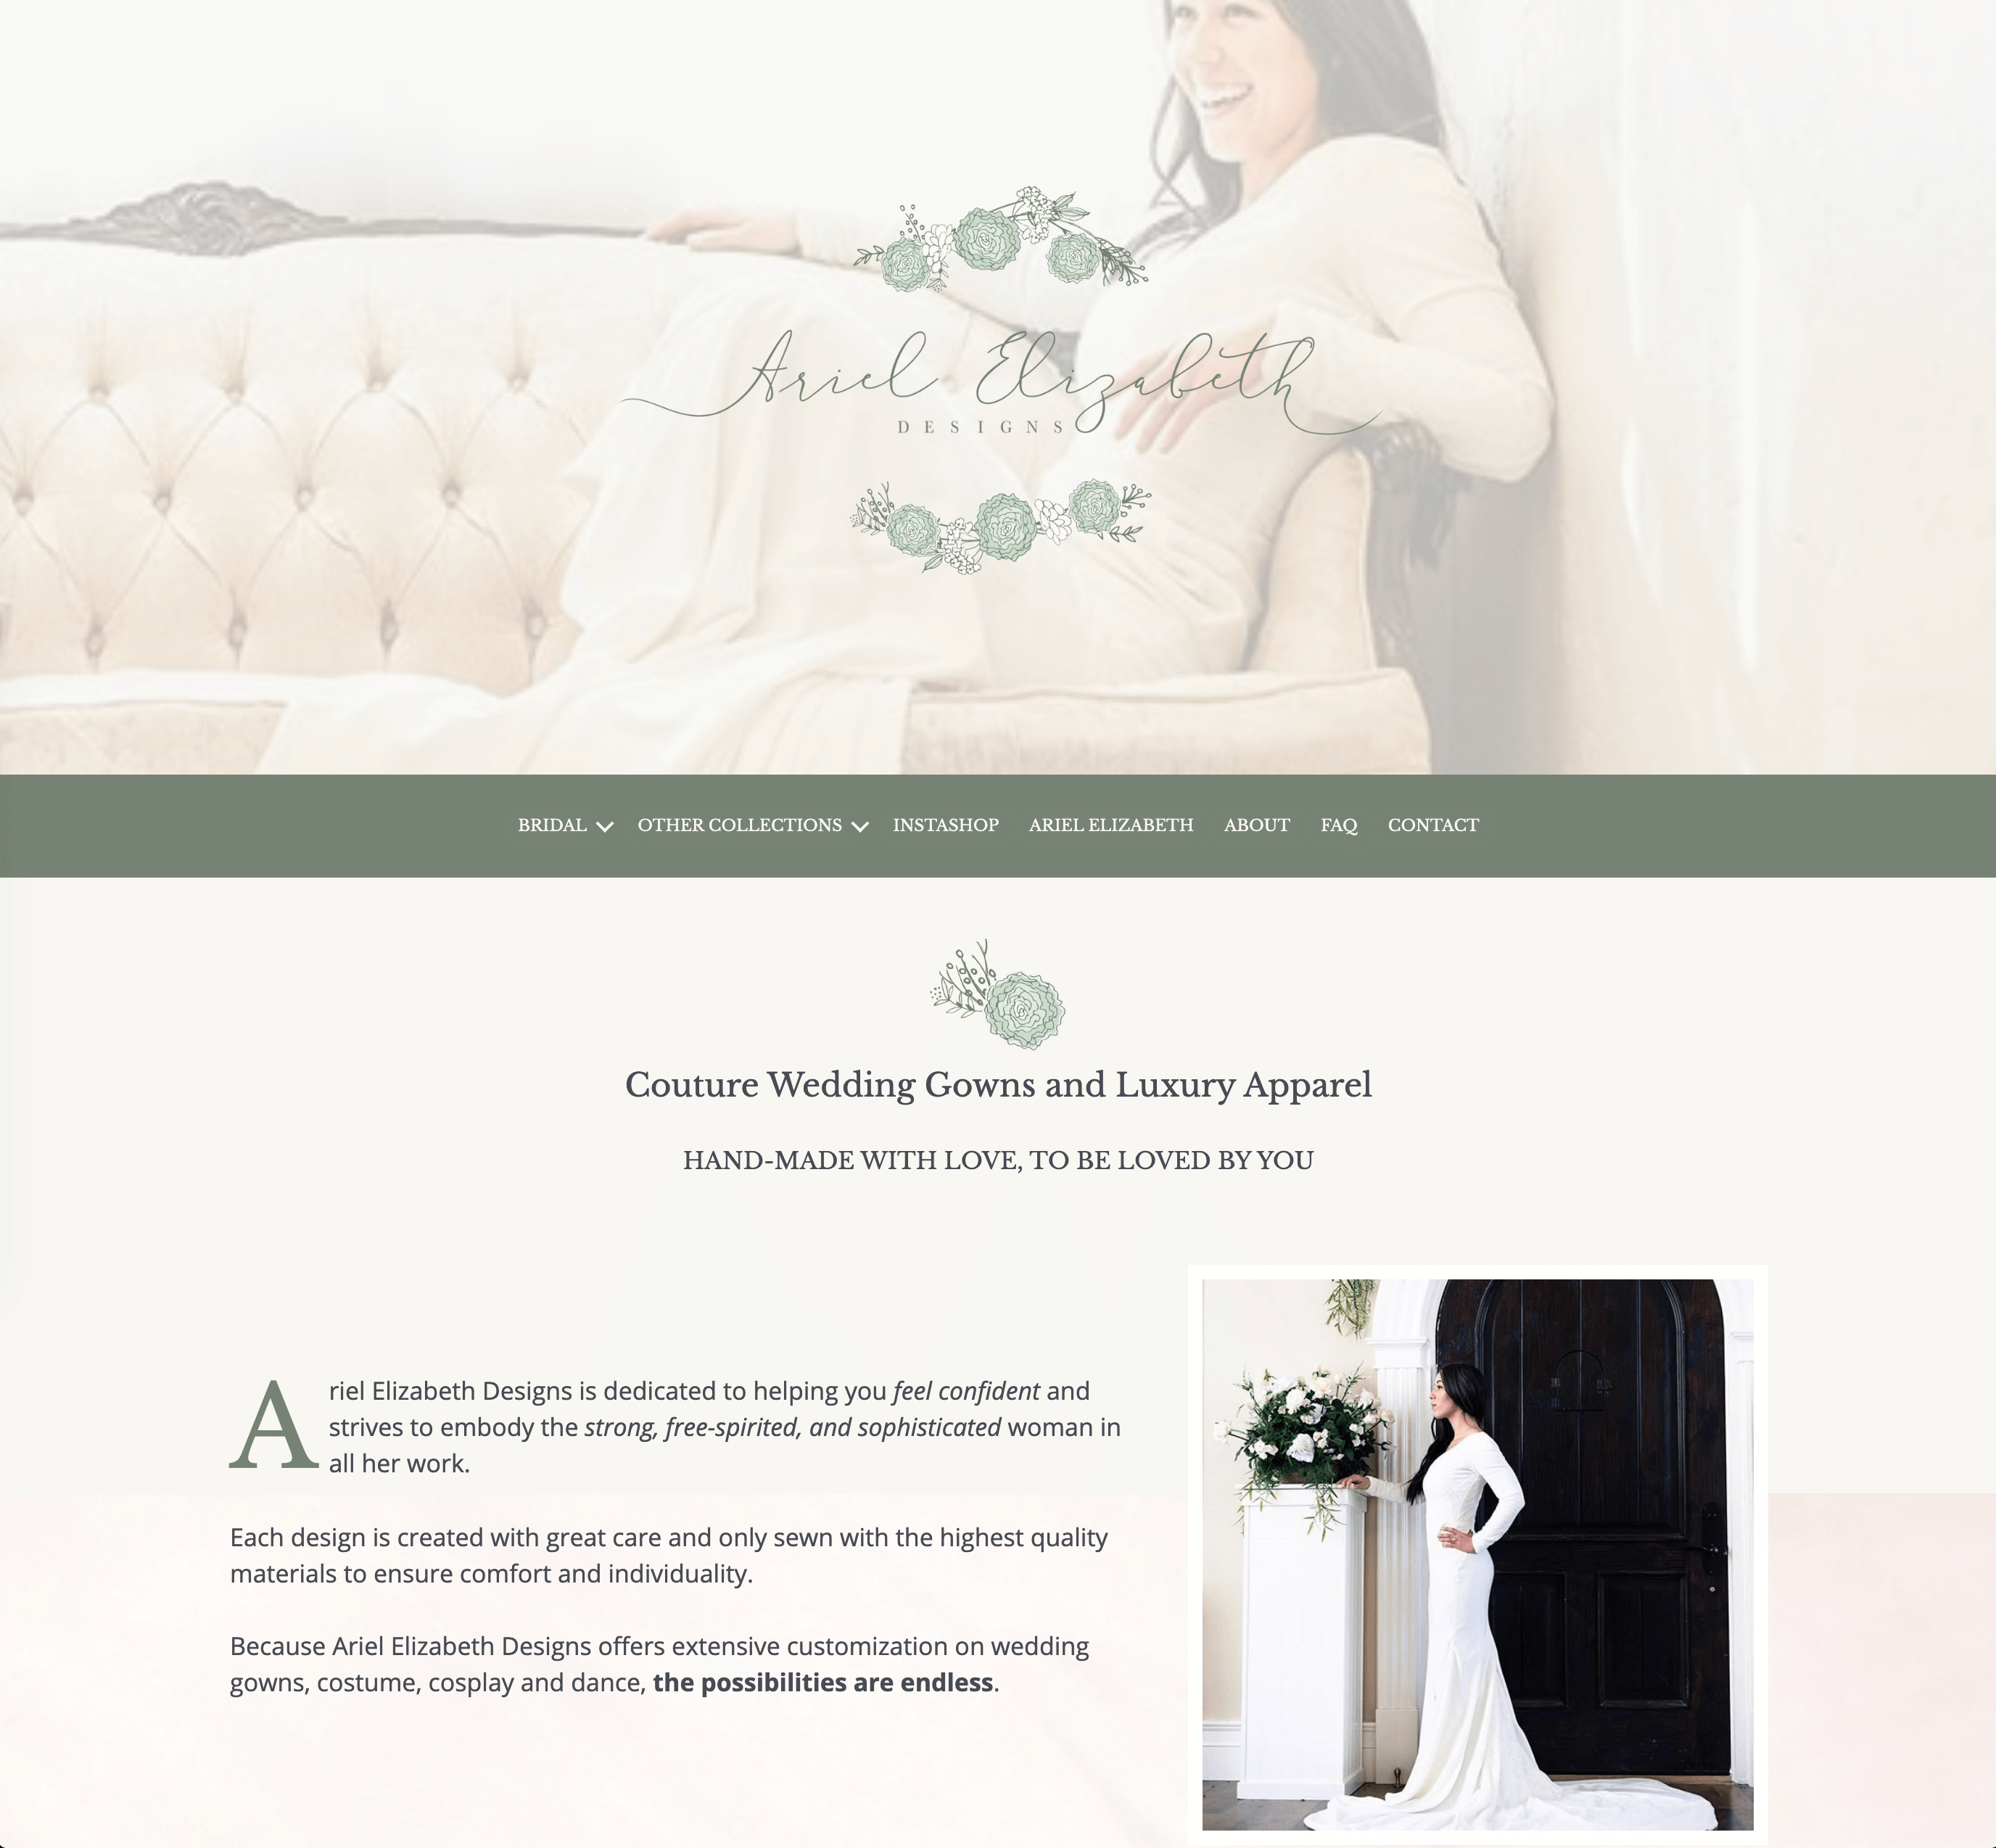 Front page of the Ariel Elizabeth Designs website.